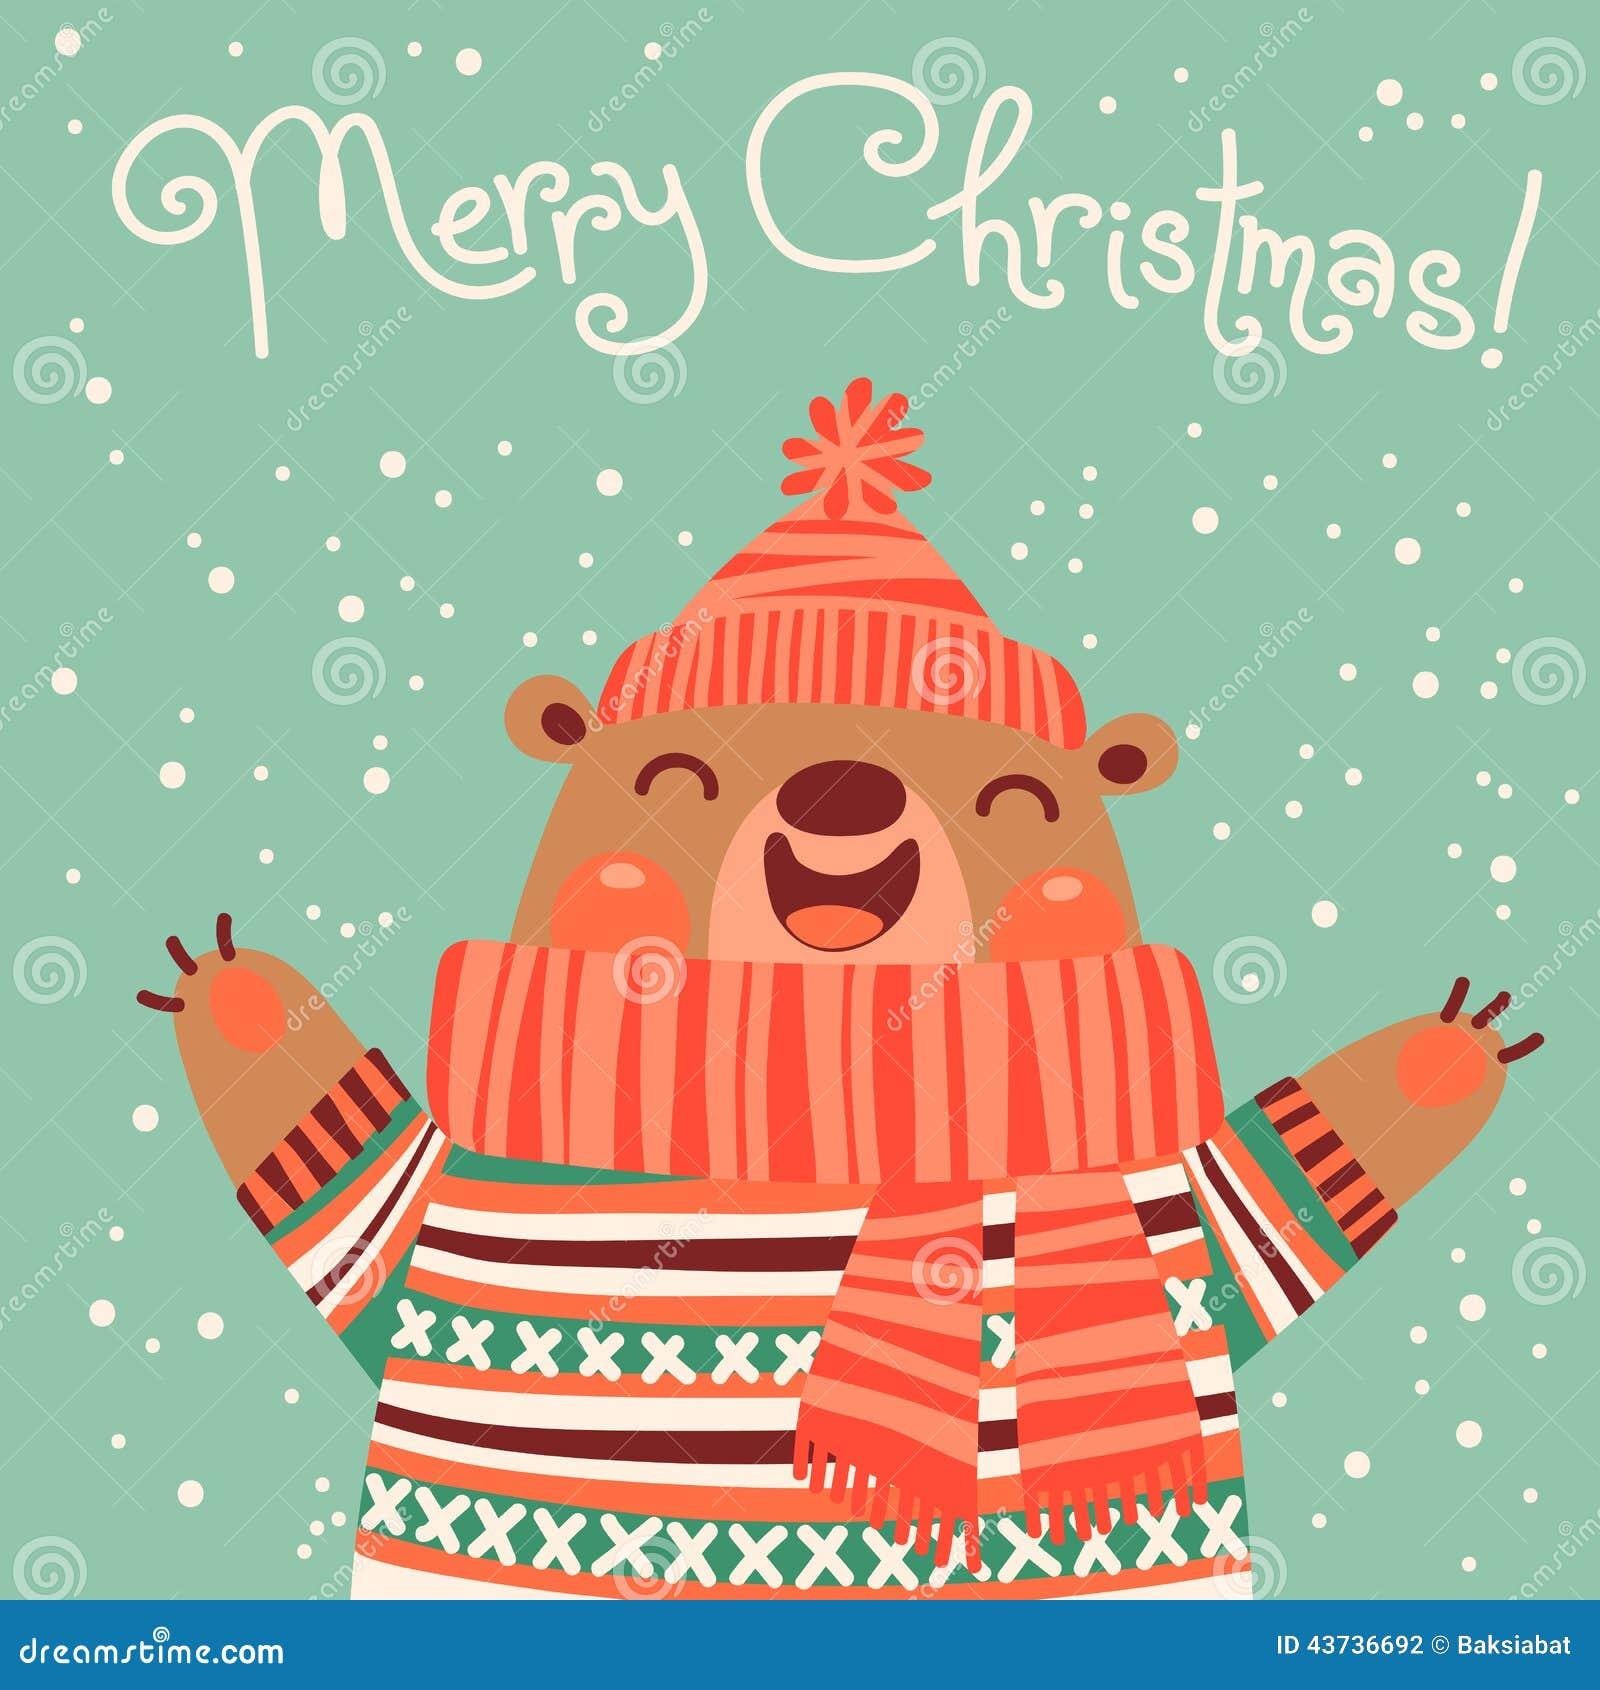 Christmas Card With A Cute Brown Bear Stock Vector Illustration